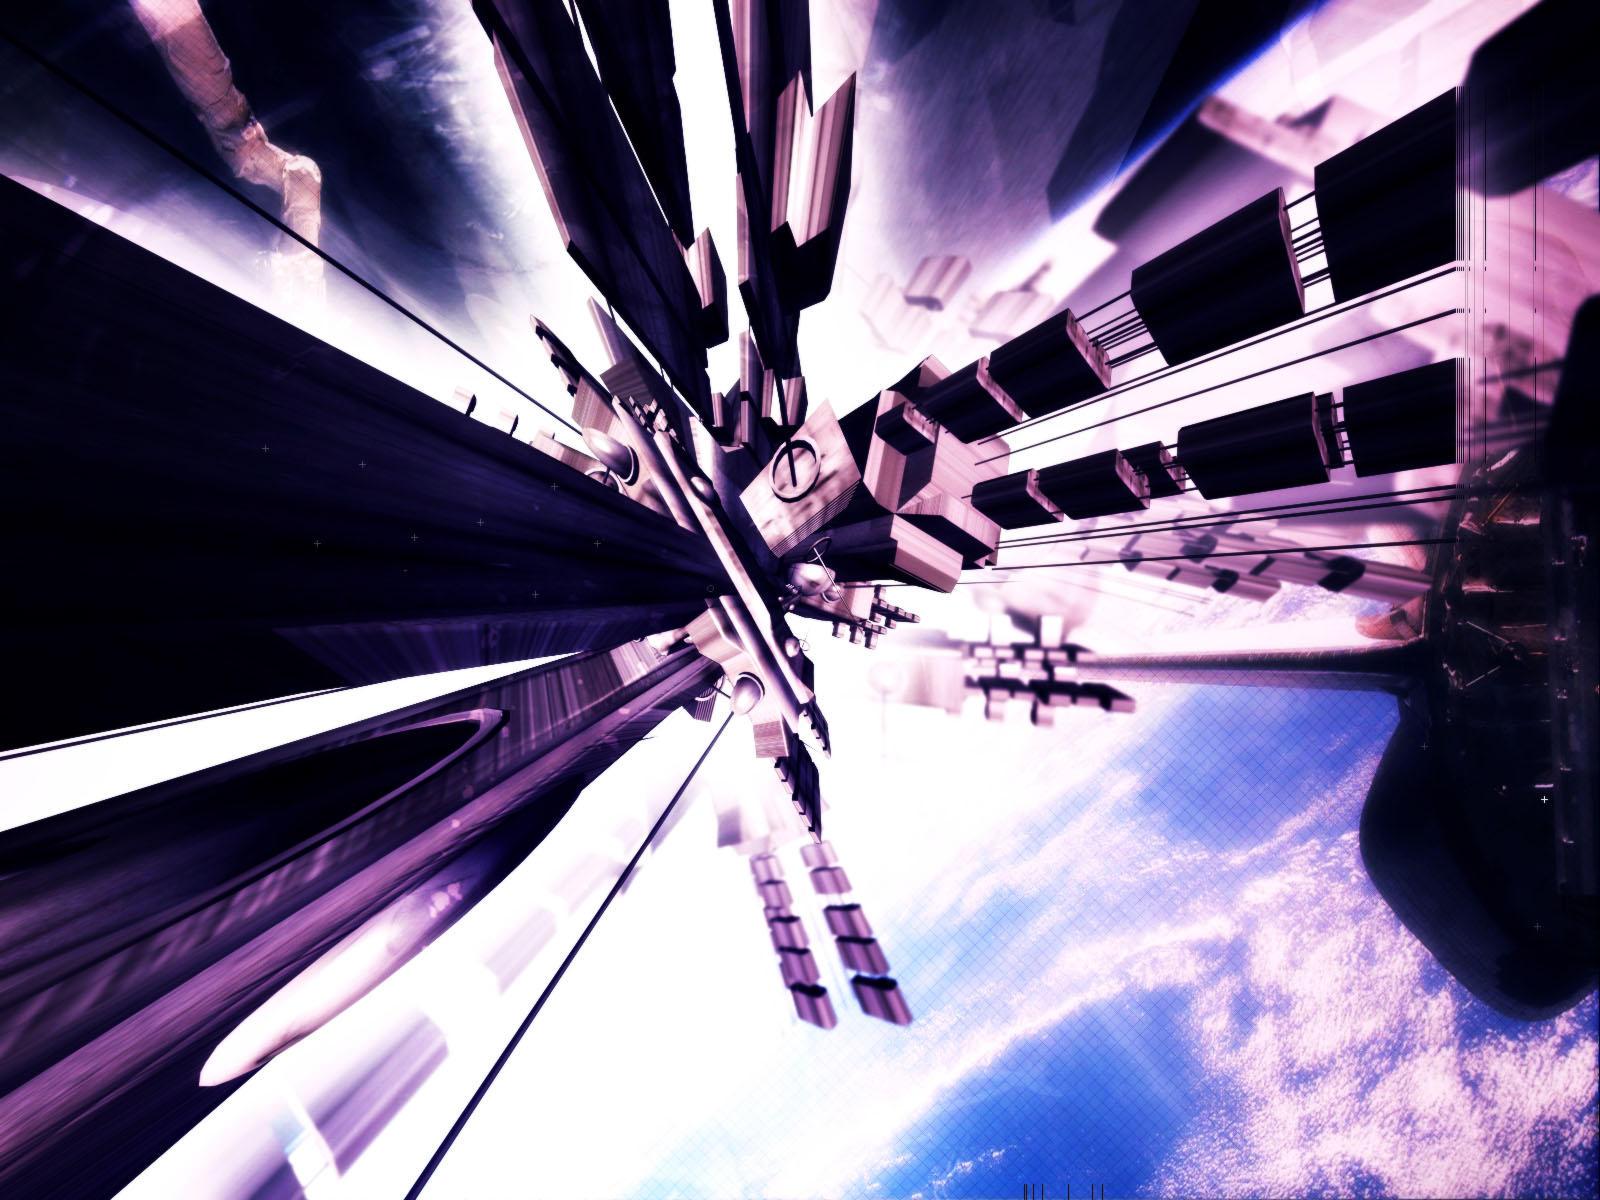 E - Sta - Kin - A by sevenflow